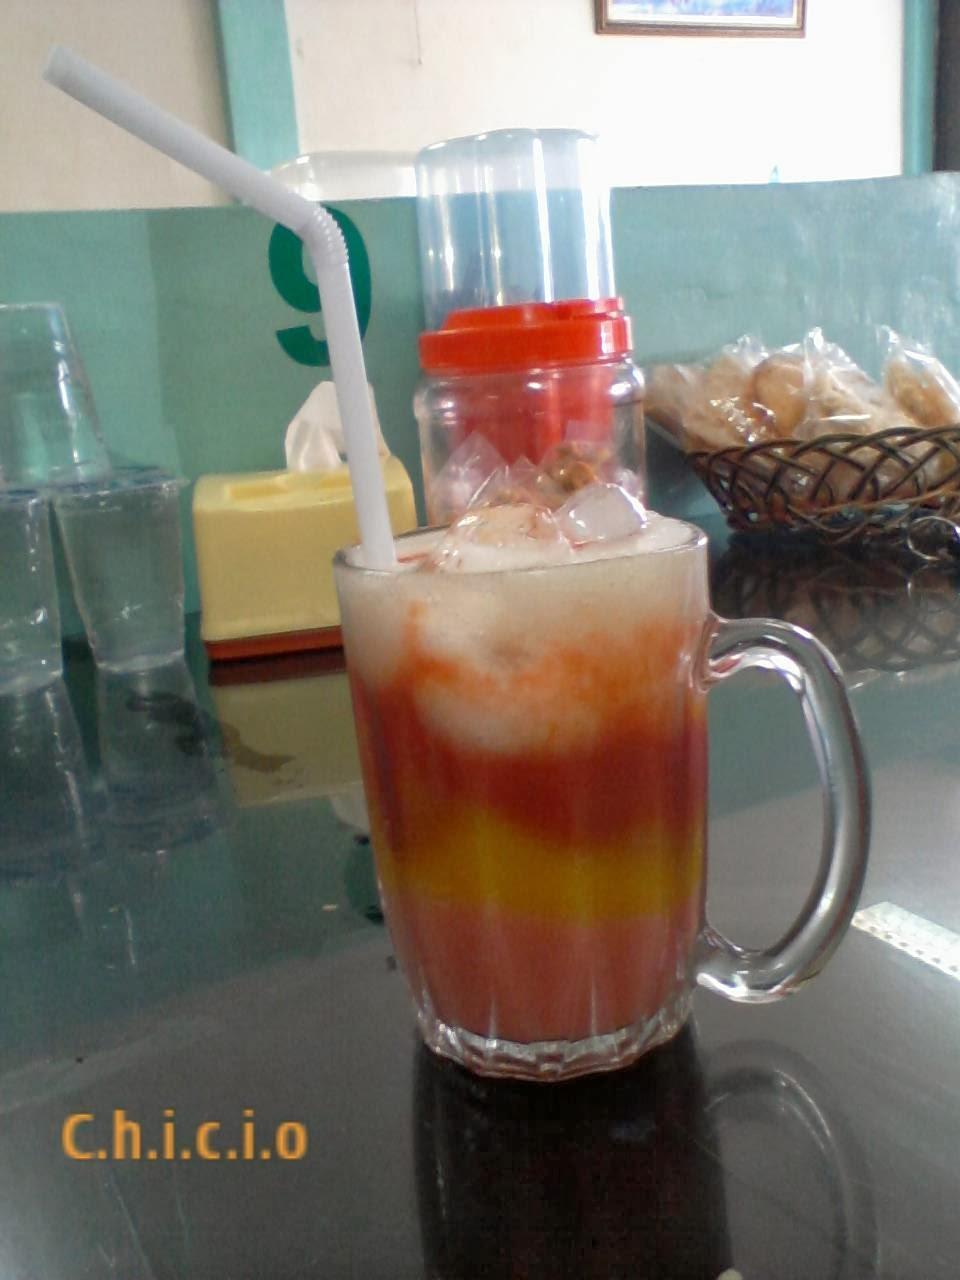 jenis-jenis juice